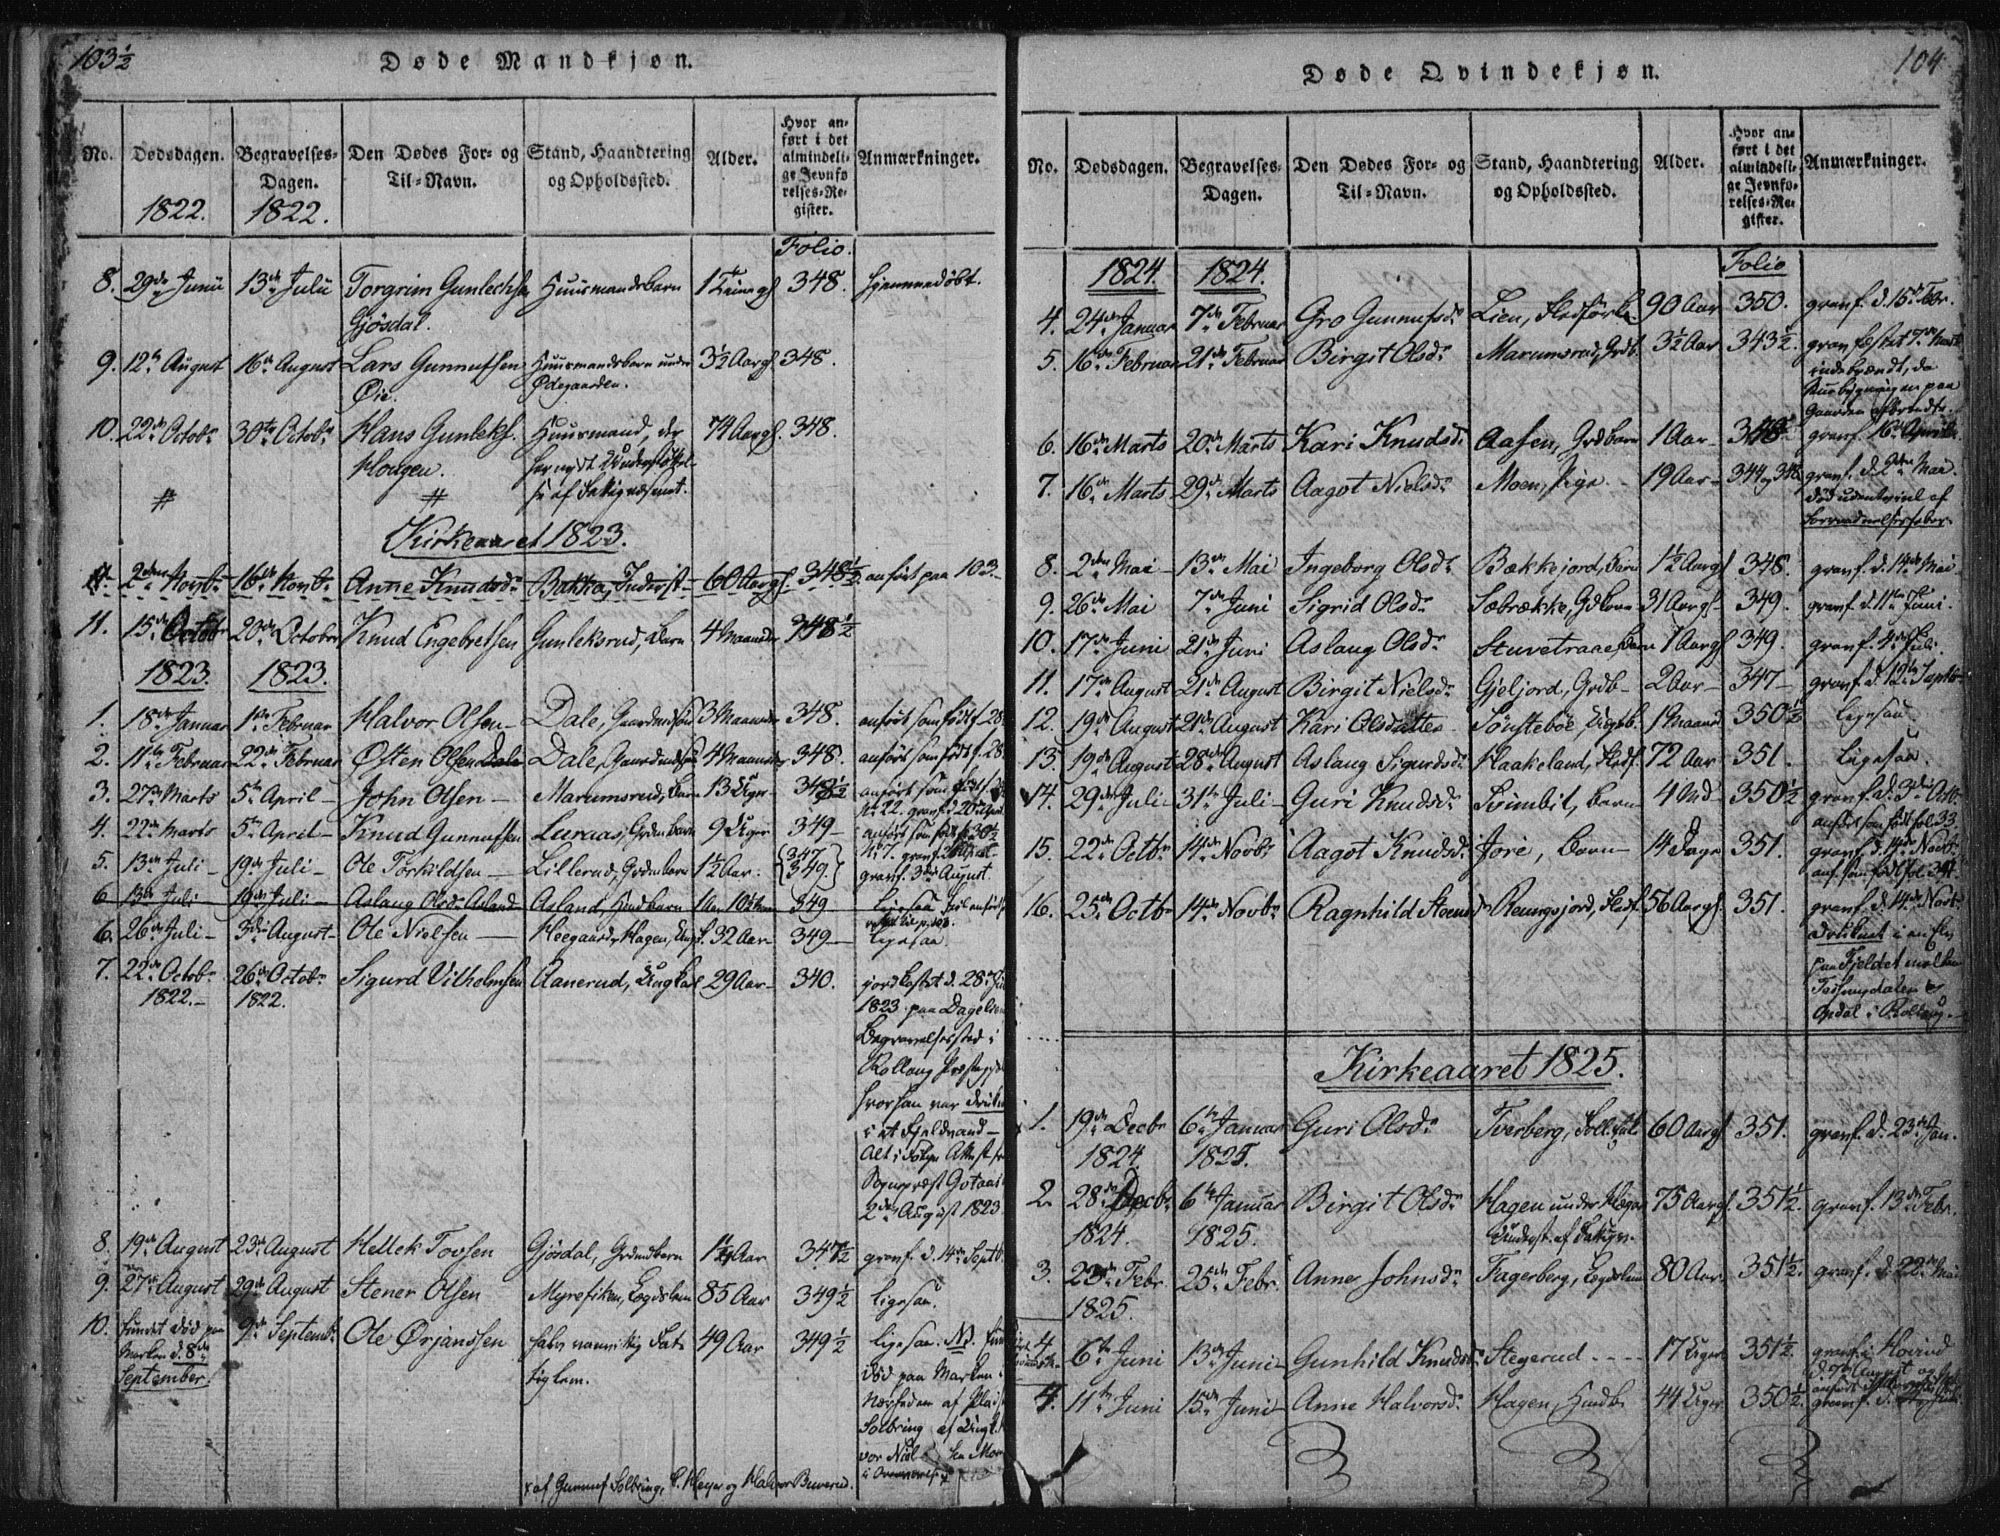 SAKO, Tinn kirkebøker, F/Fa/L0004: Ministerialbok nr. I 4, 1815-1843, s. 104